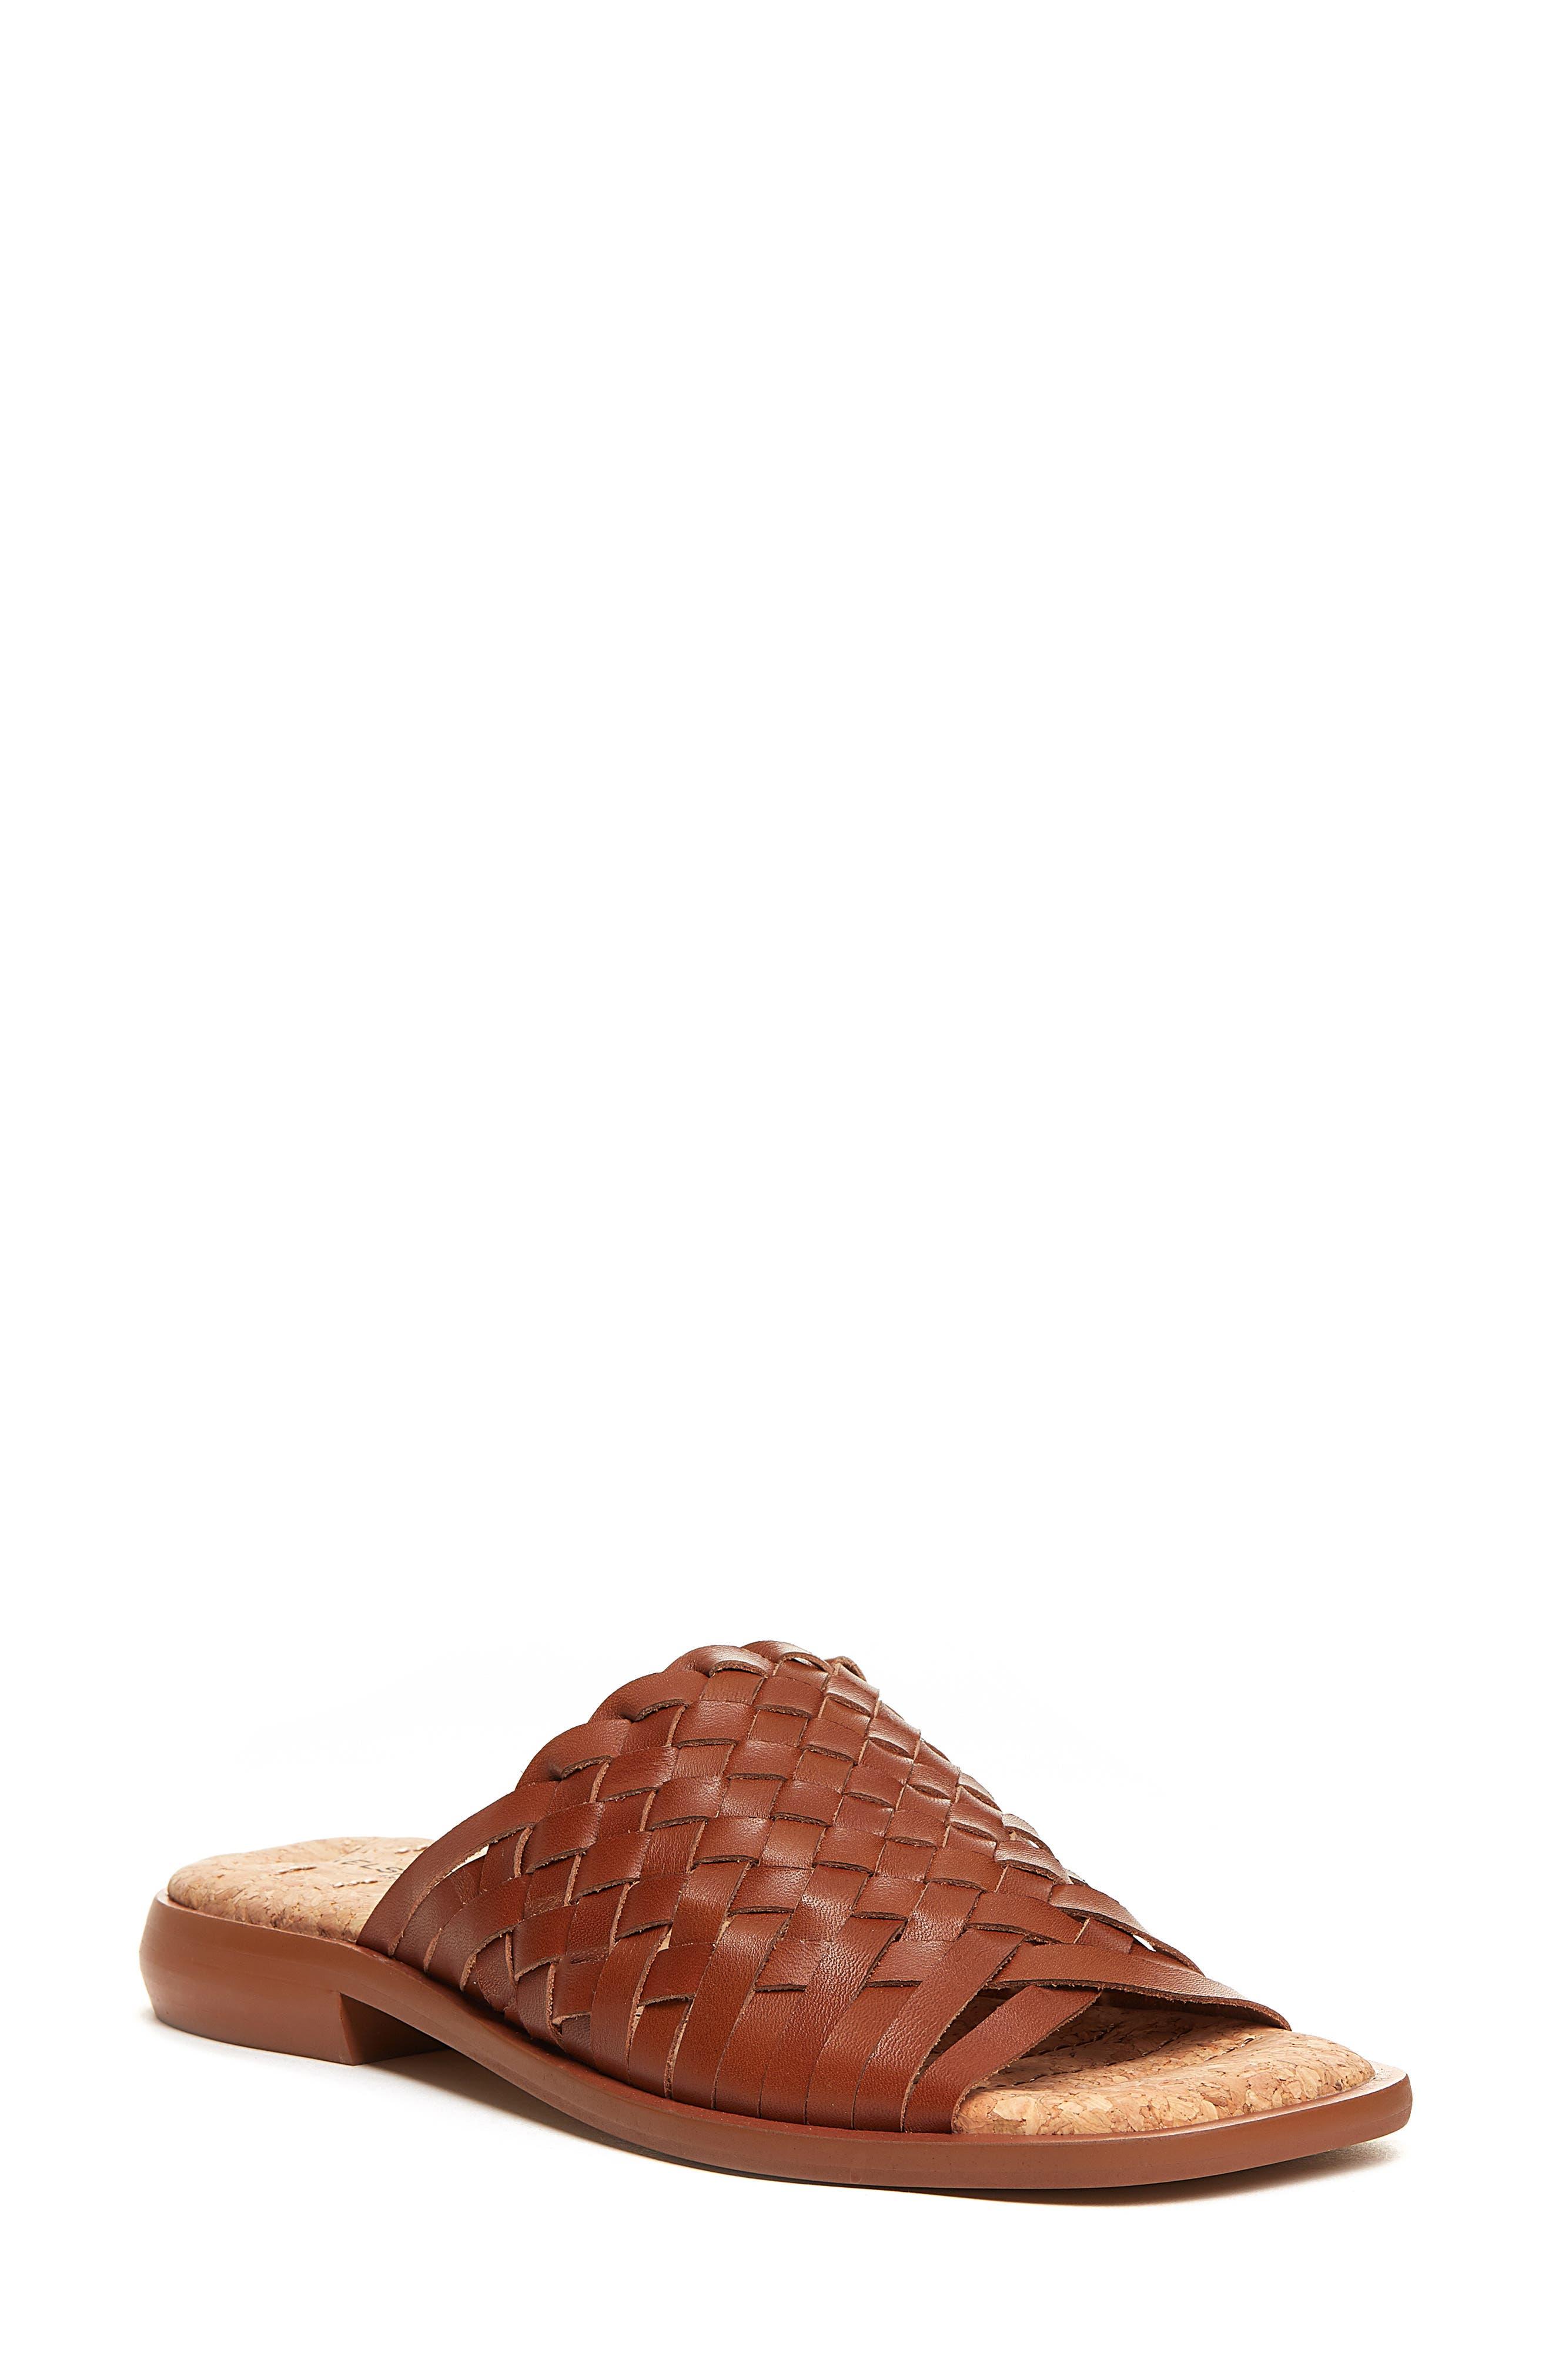 Tide Woven Leather Slide Sandal